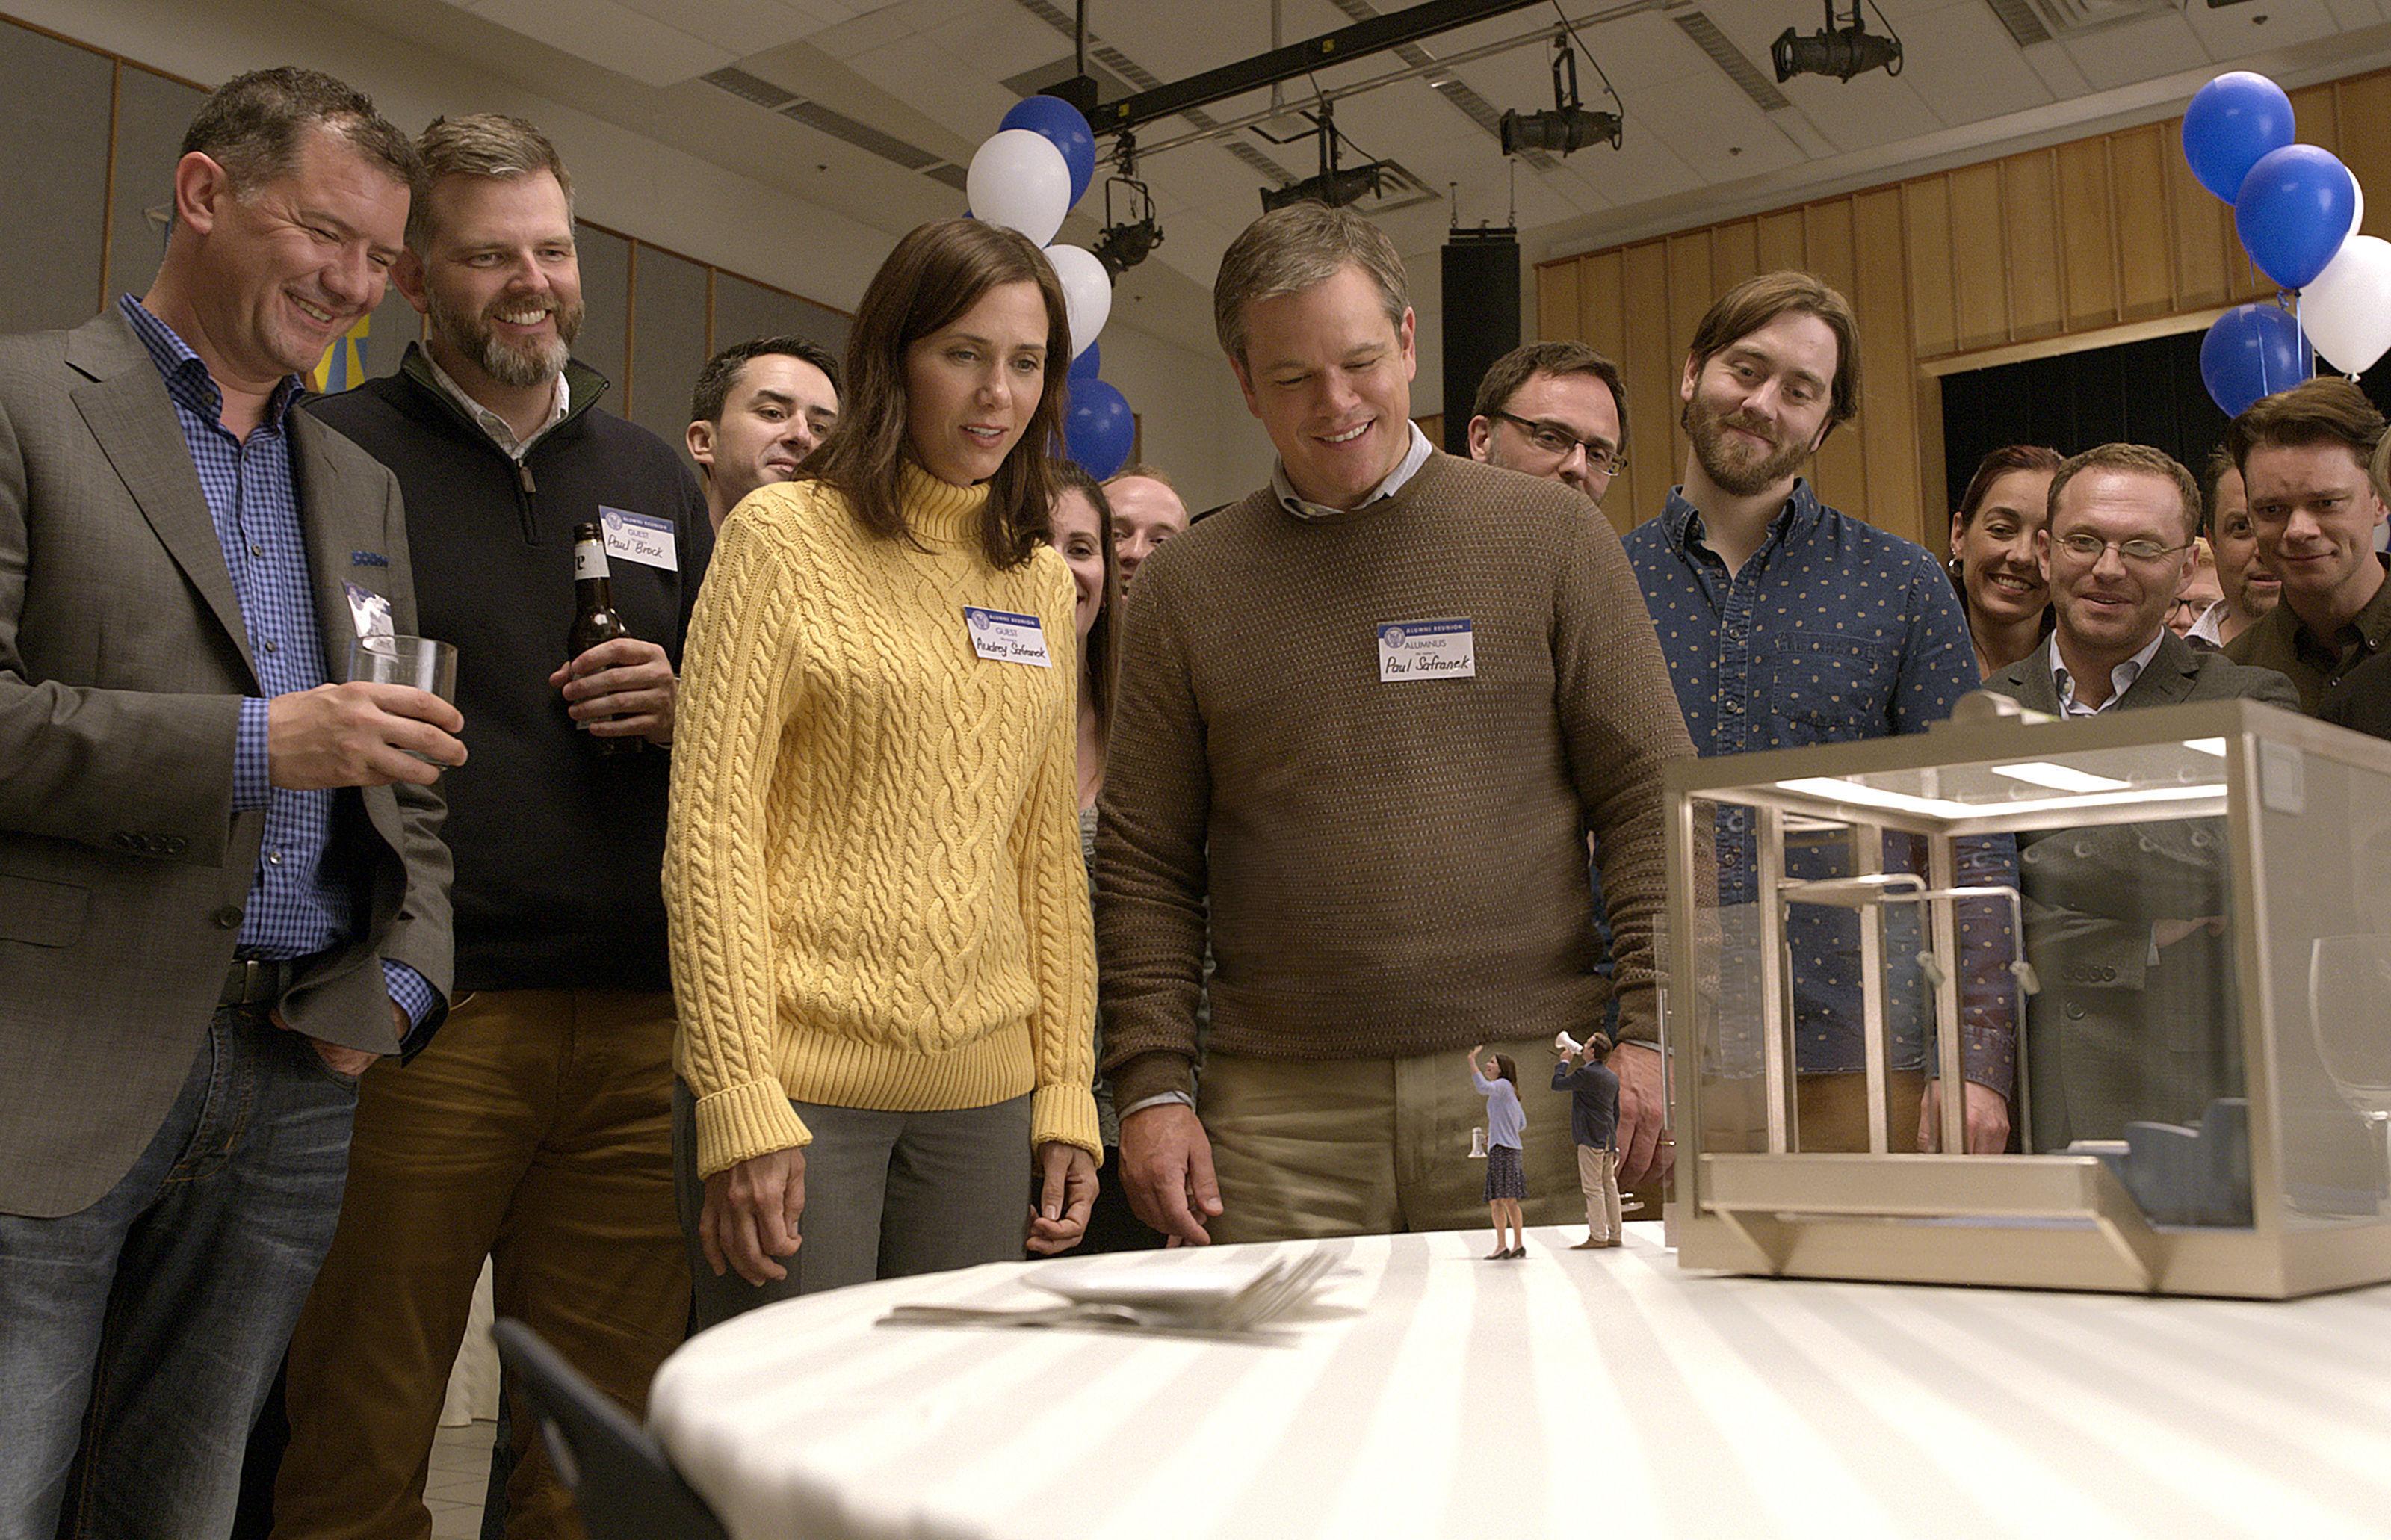 Kristen Wiig as Audrey Safranek, Matt Damon as Paul Safranek, Maribeth Monroe as Carol Johnson and Jason Sudeikis as Dave Johnson.